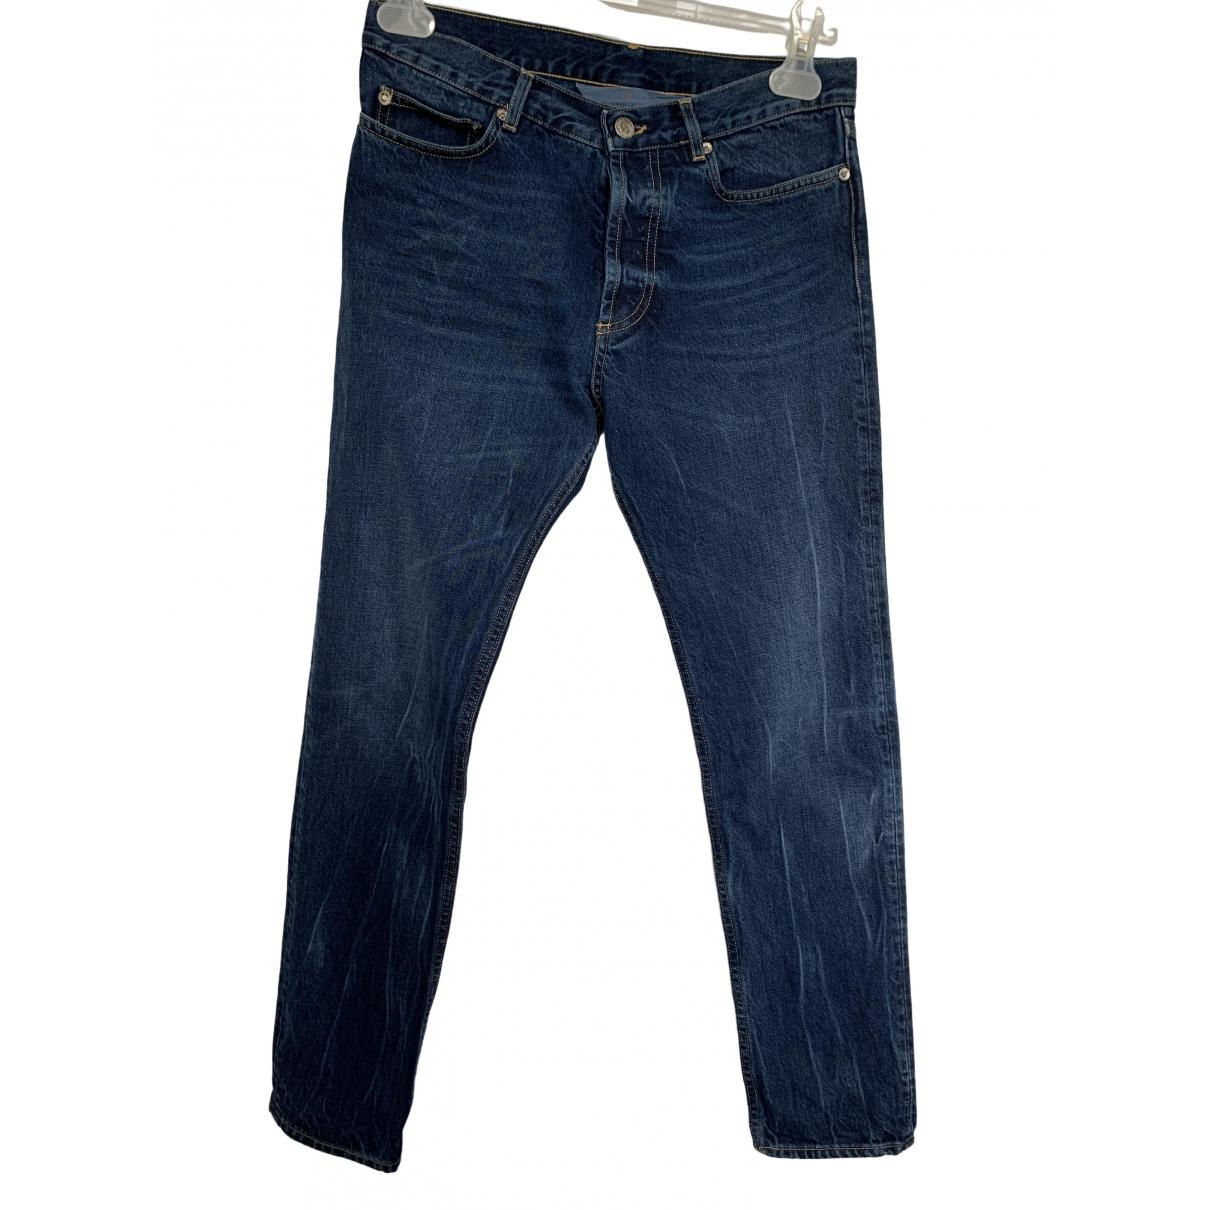 Golden Goose \N Blue Cotton Jeans for Women 25 US